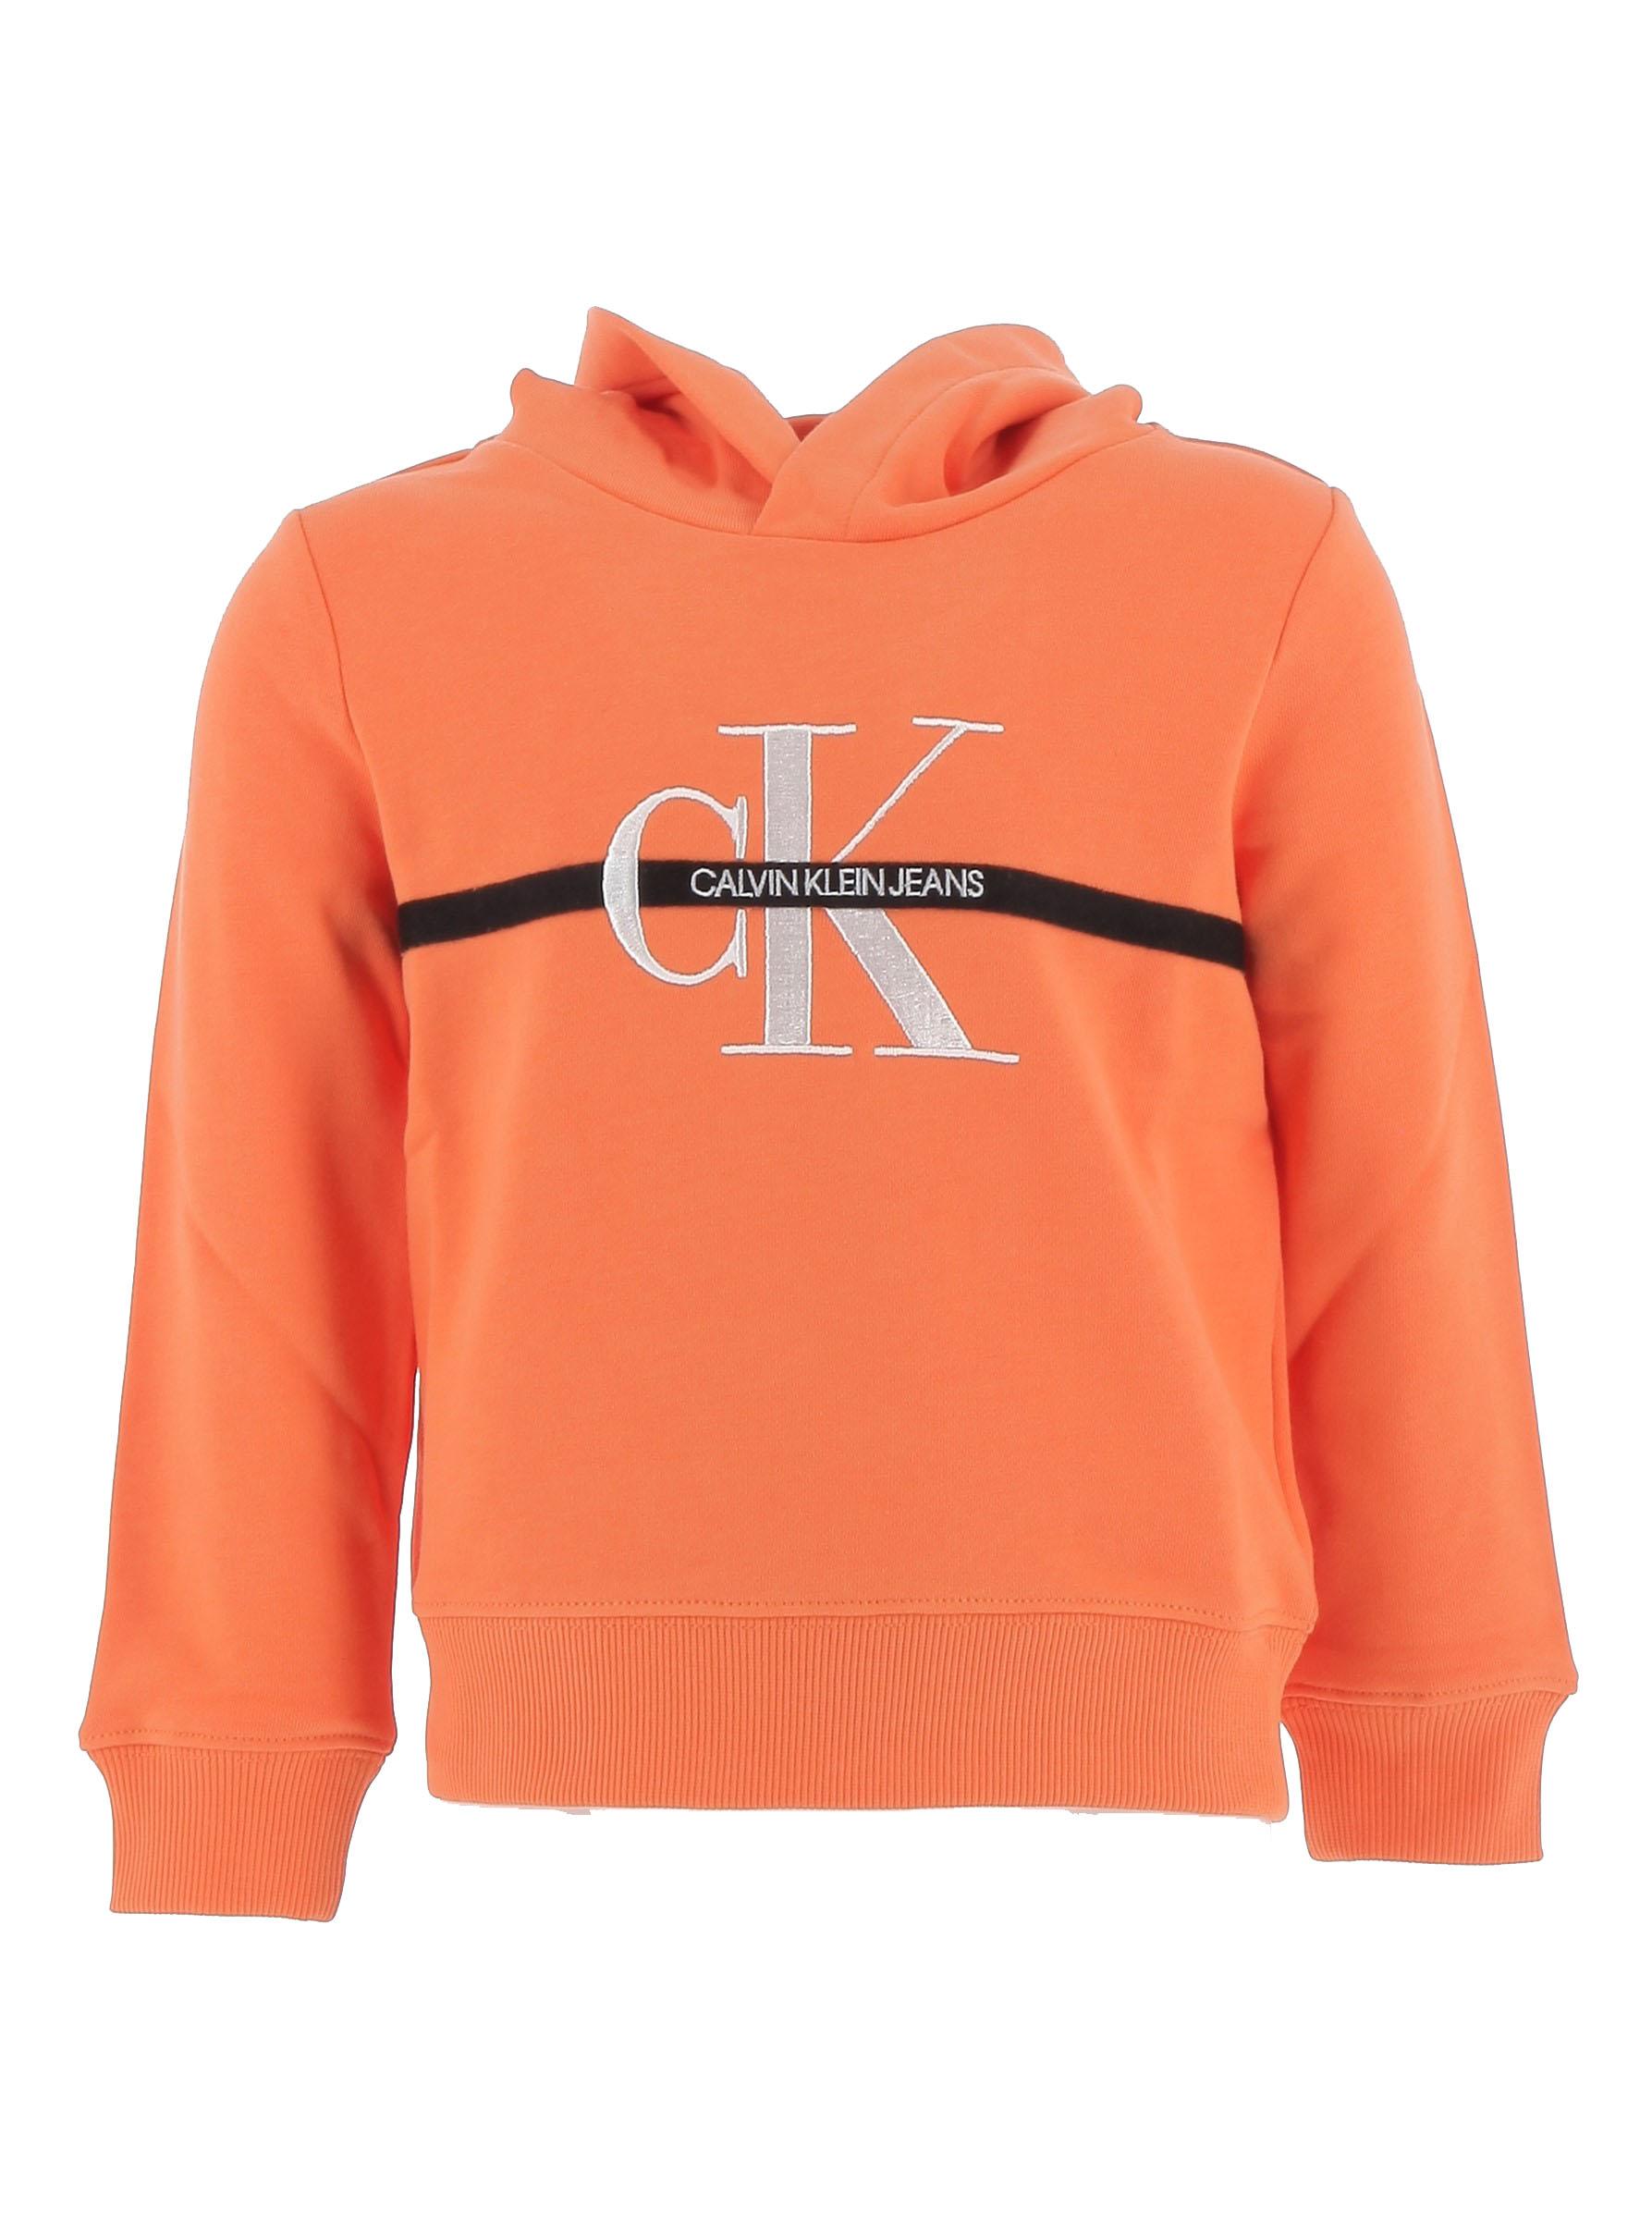 Calvin Klein sweatshirt CALVIN KLEIN | Sweatshirt | IB0IB00465SD9